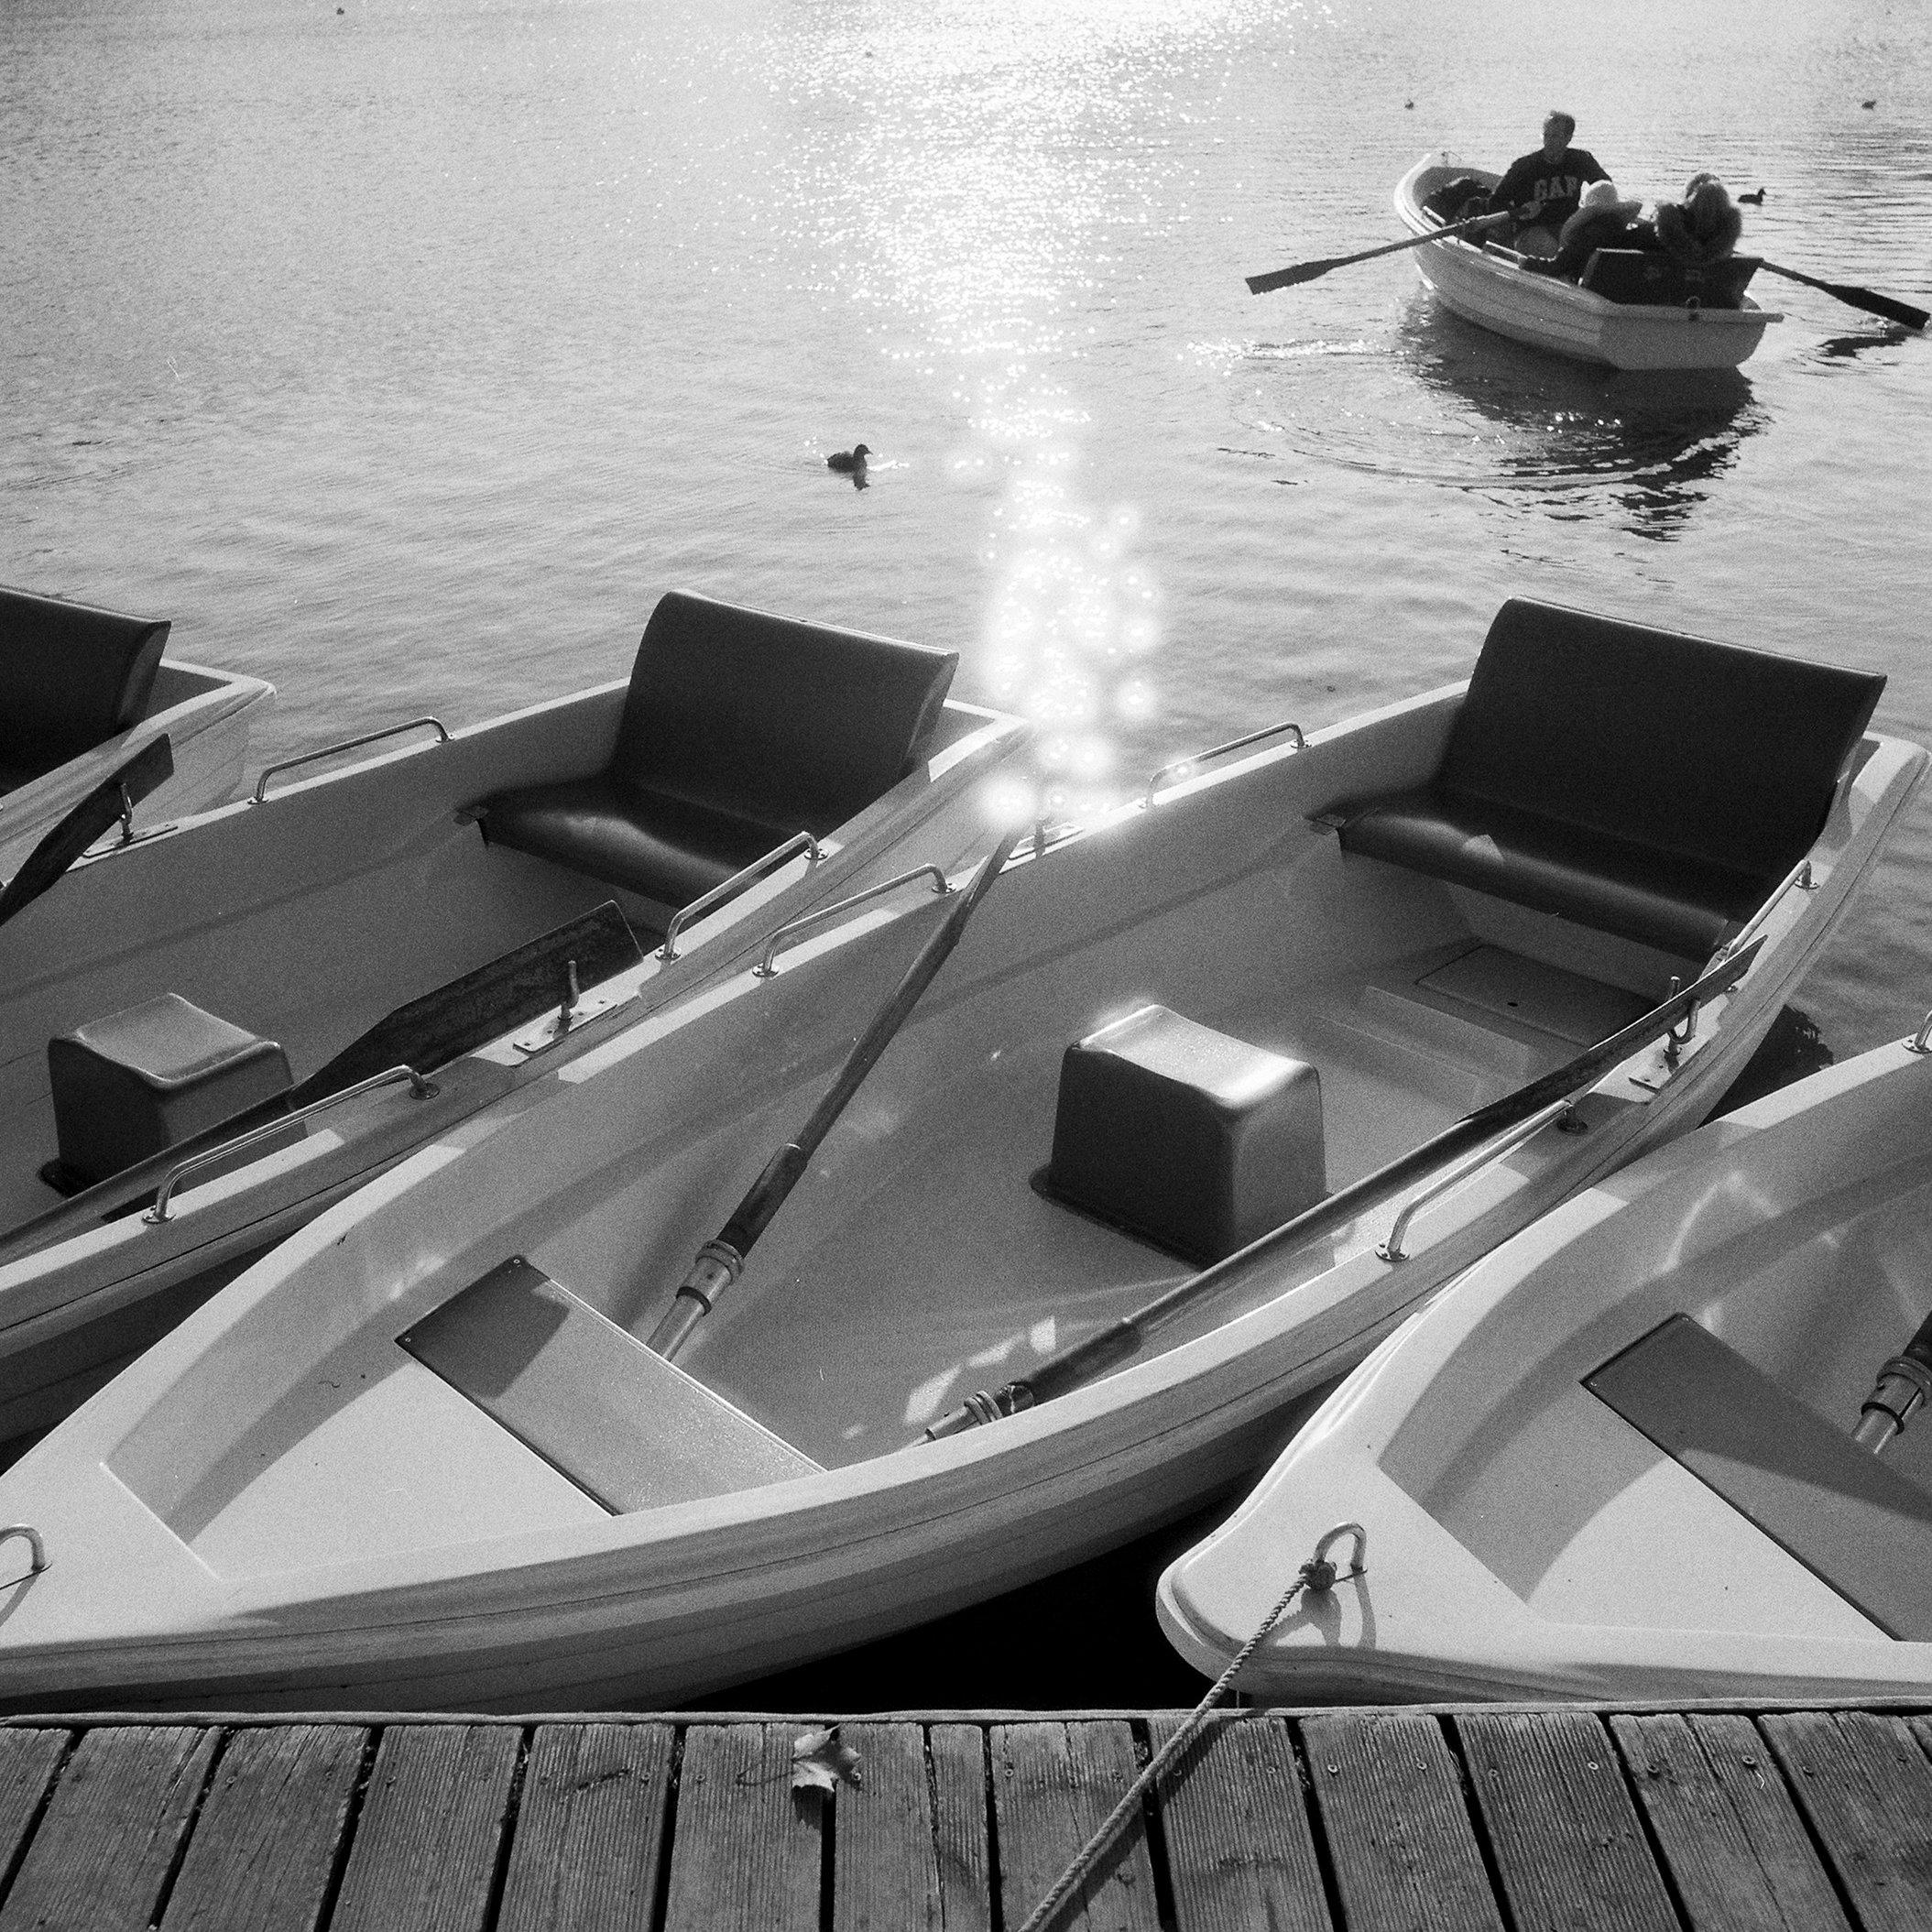 paris-boats-versailles-black-and-white-film